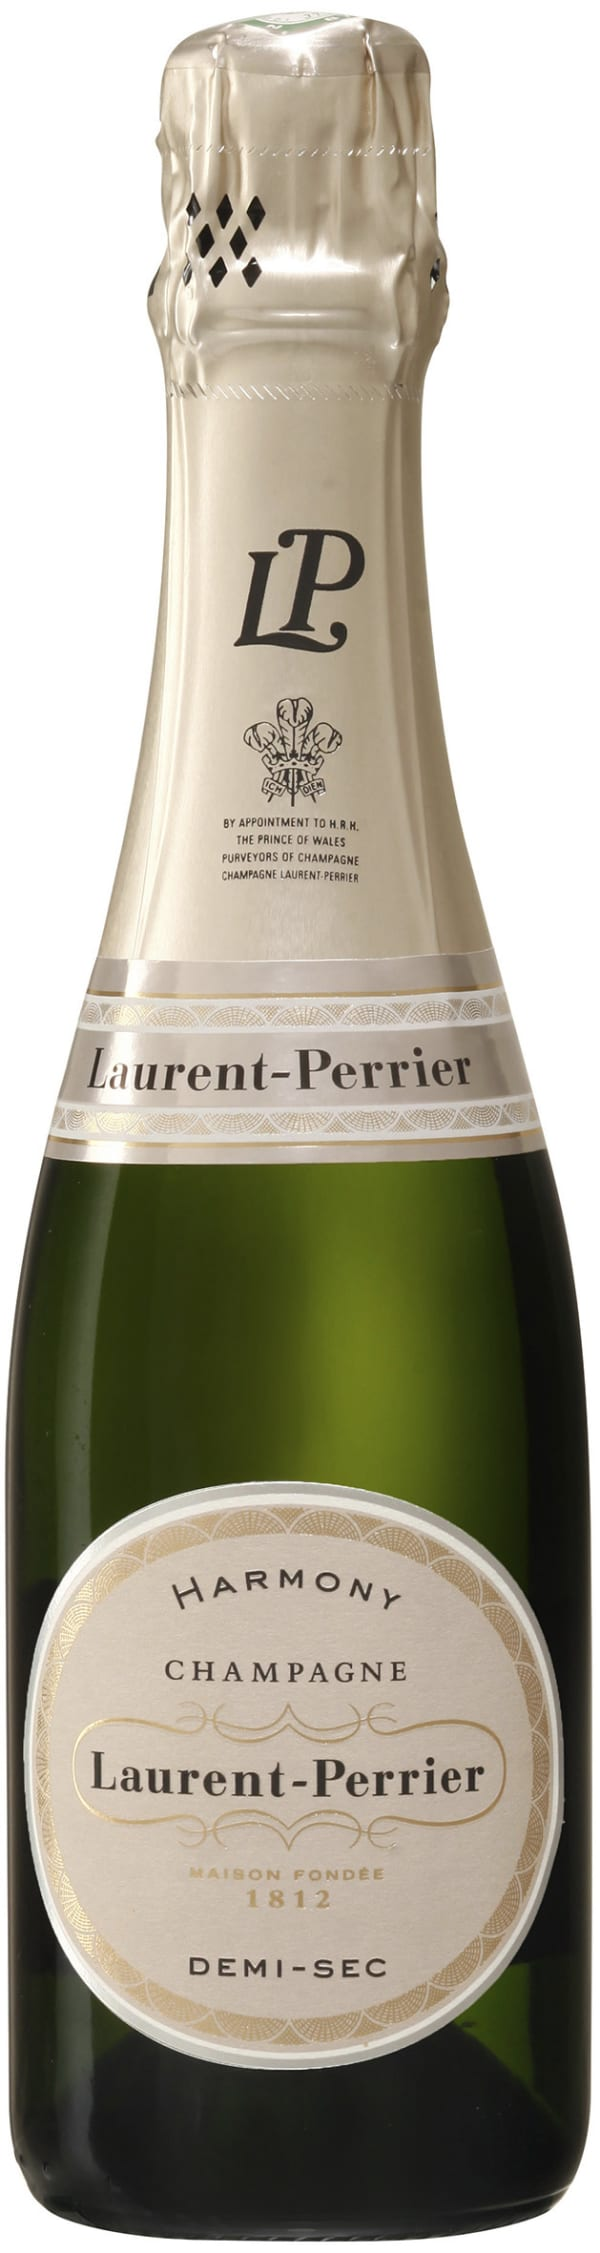 Laurent-Perrier Champagne Demi-Sec